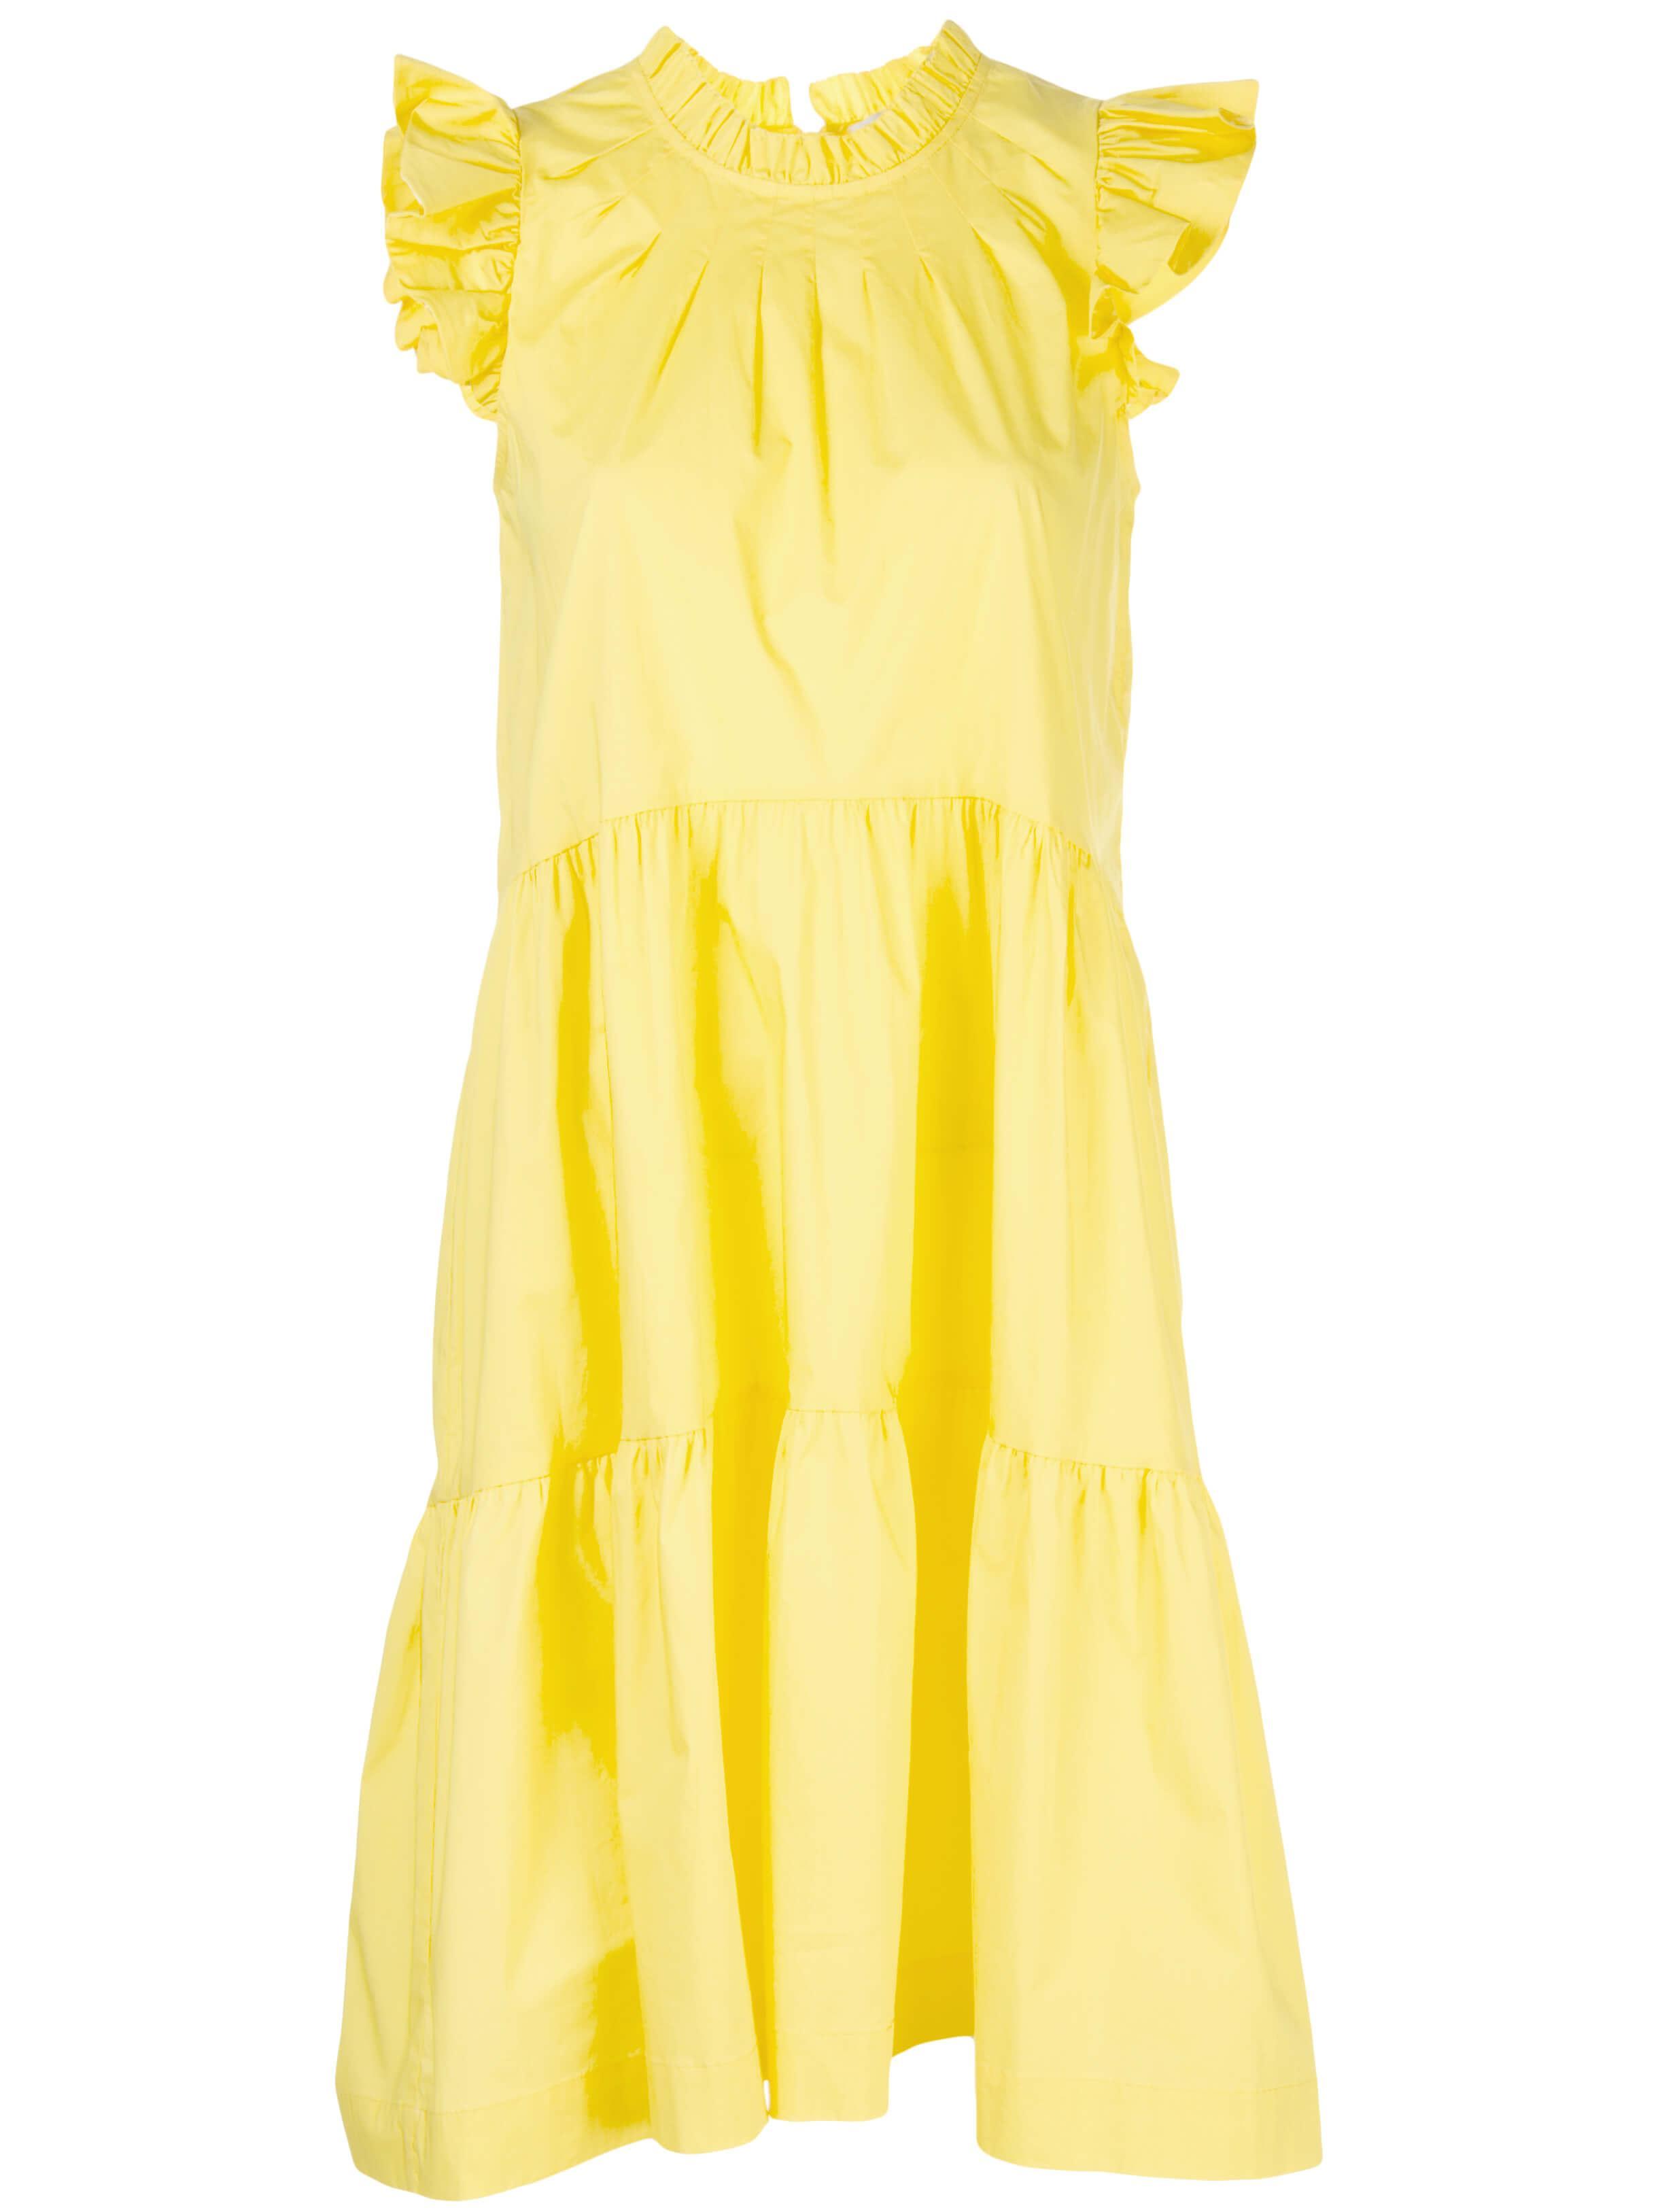 Tabitha Tiered Dress